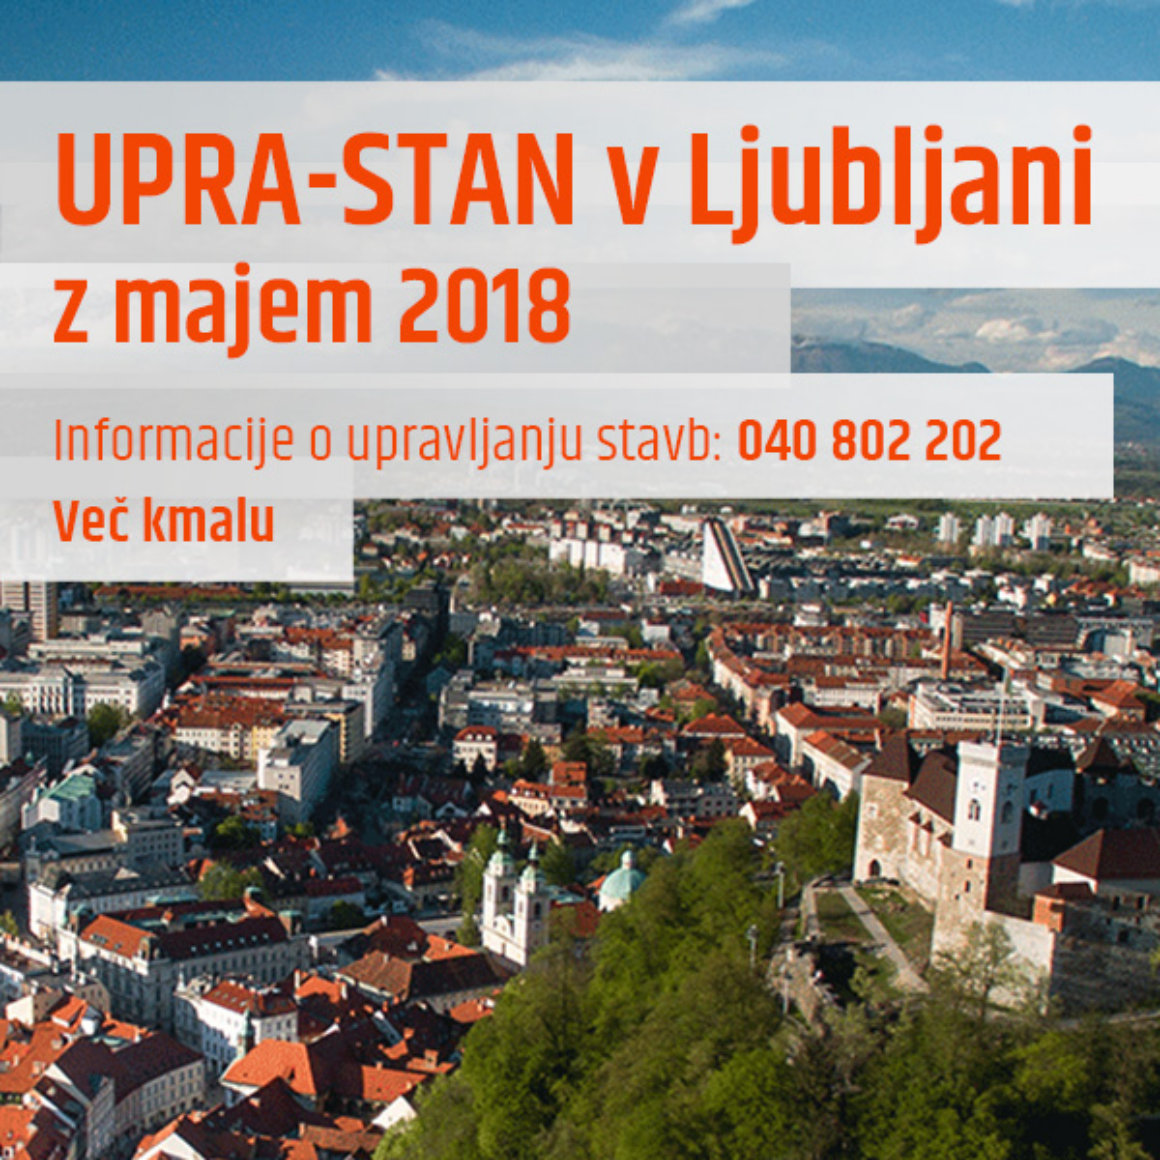 Uprastan-Ljubljana-Mailchimp